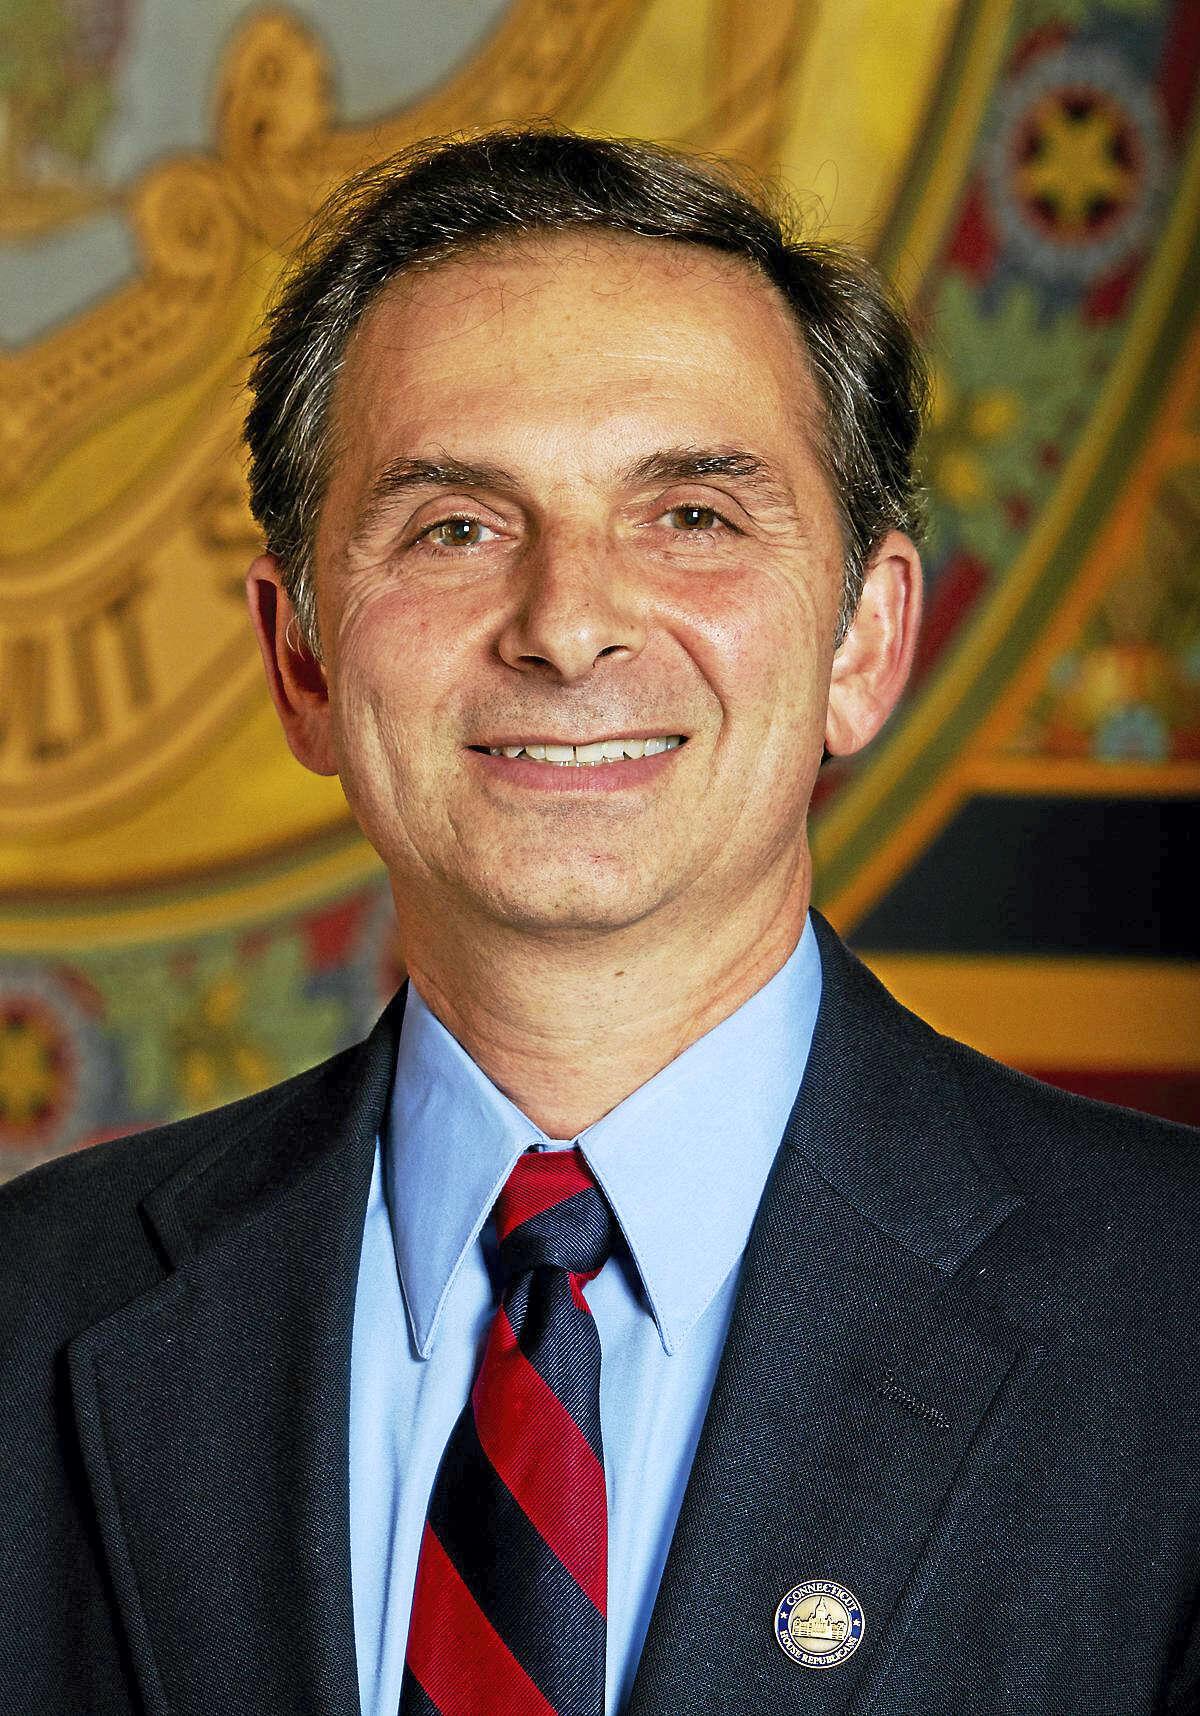 State Rep. Dave Yaccarino, R-North Haven.